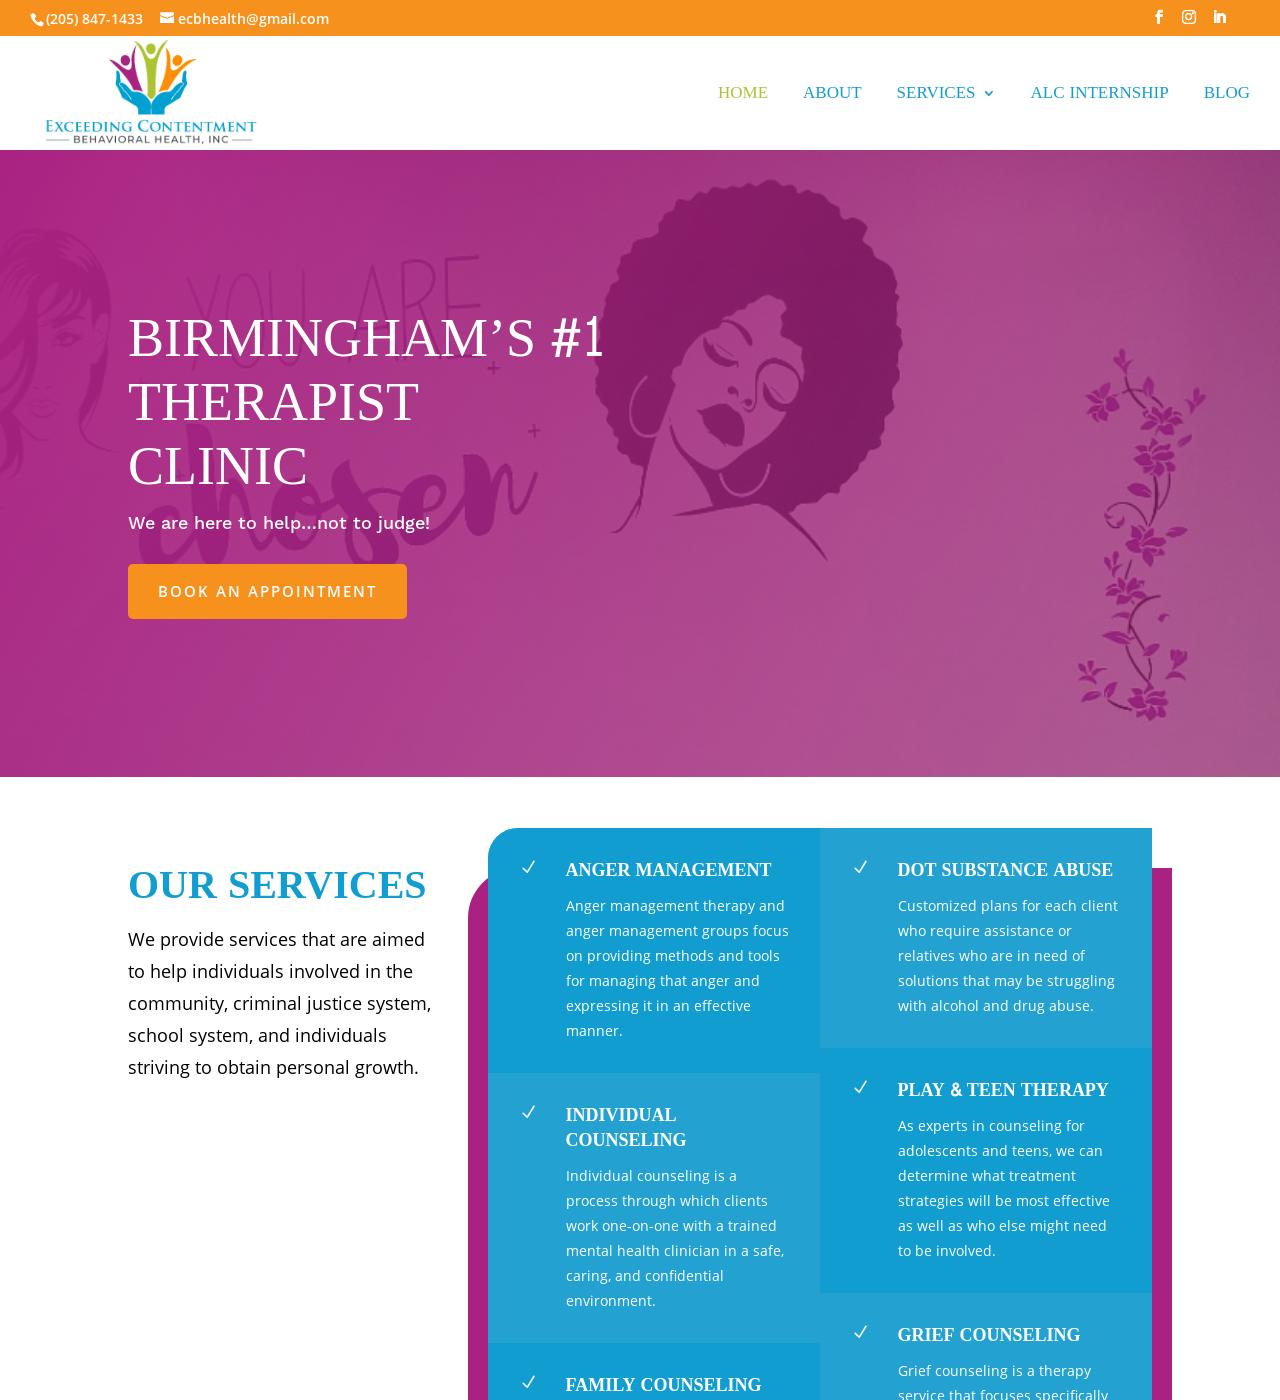 Birmingham-Website-Design-Agency-C-Kinion-Design-Exceeding-Contentment-Behavioral-Health-Inc